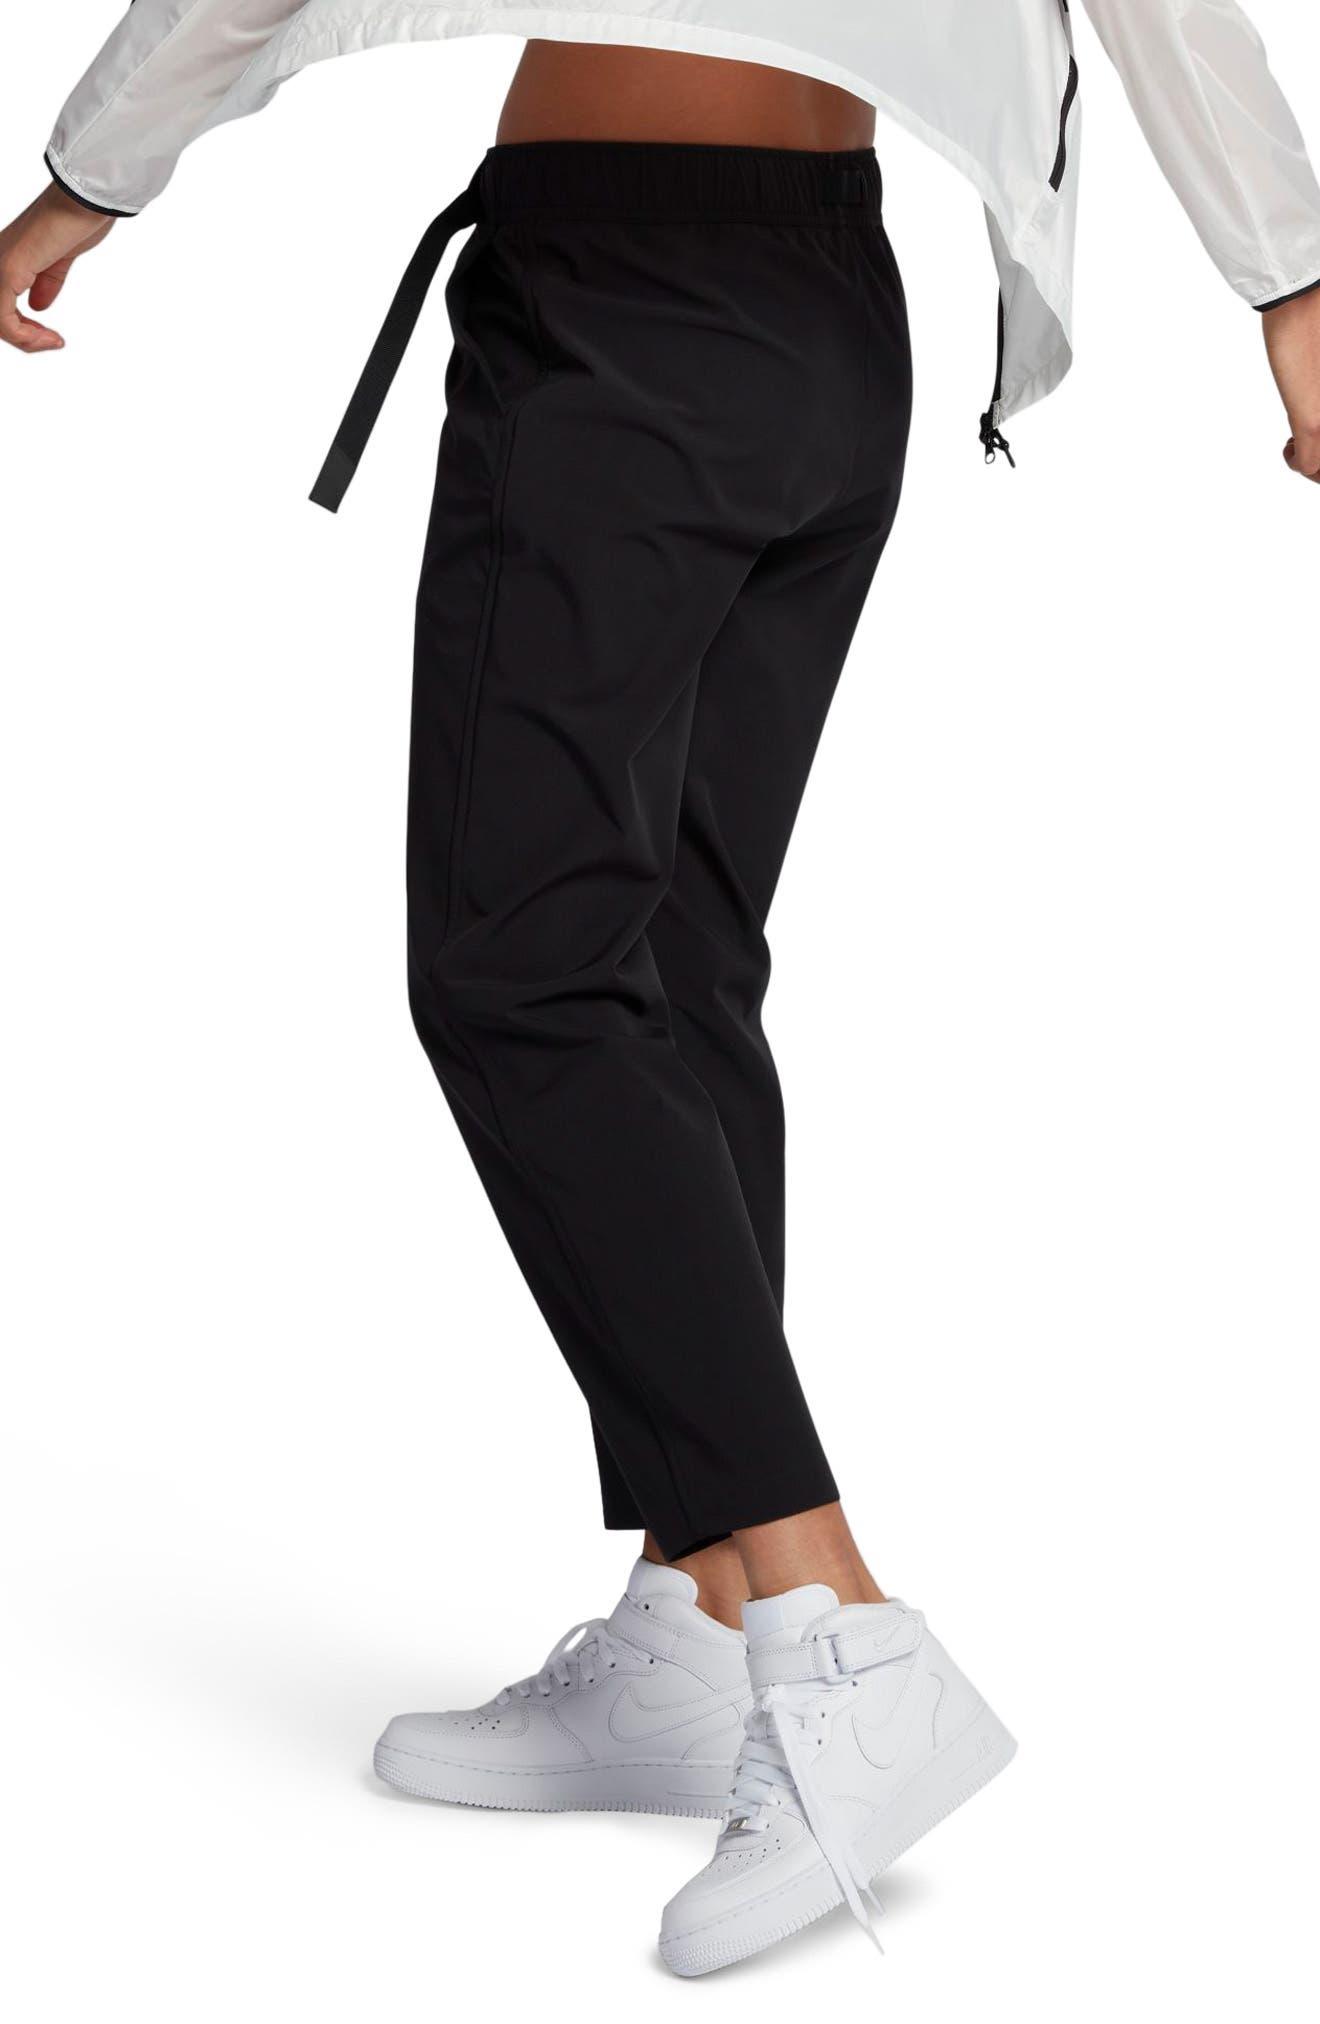 NikeLab Essentials Women's Stretch Woven Pants,                             Alternate thumbnail 4, color,                             Black/ Black